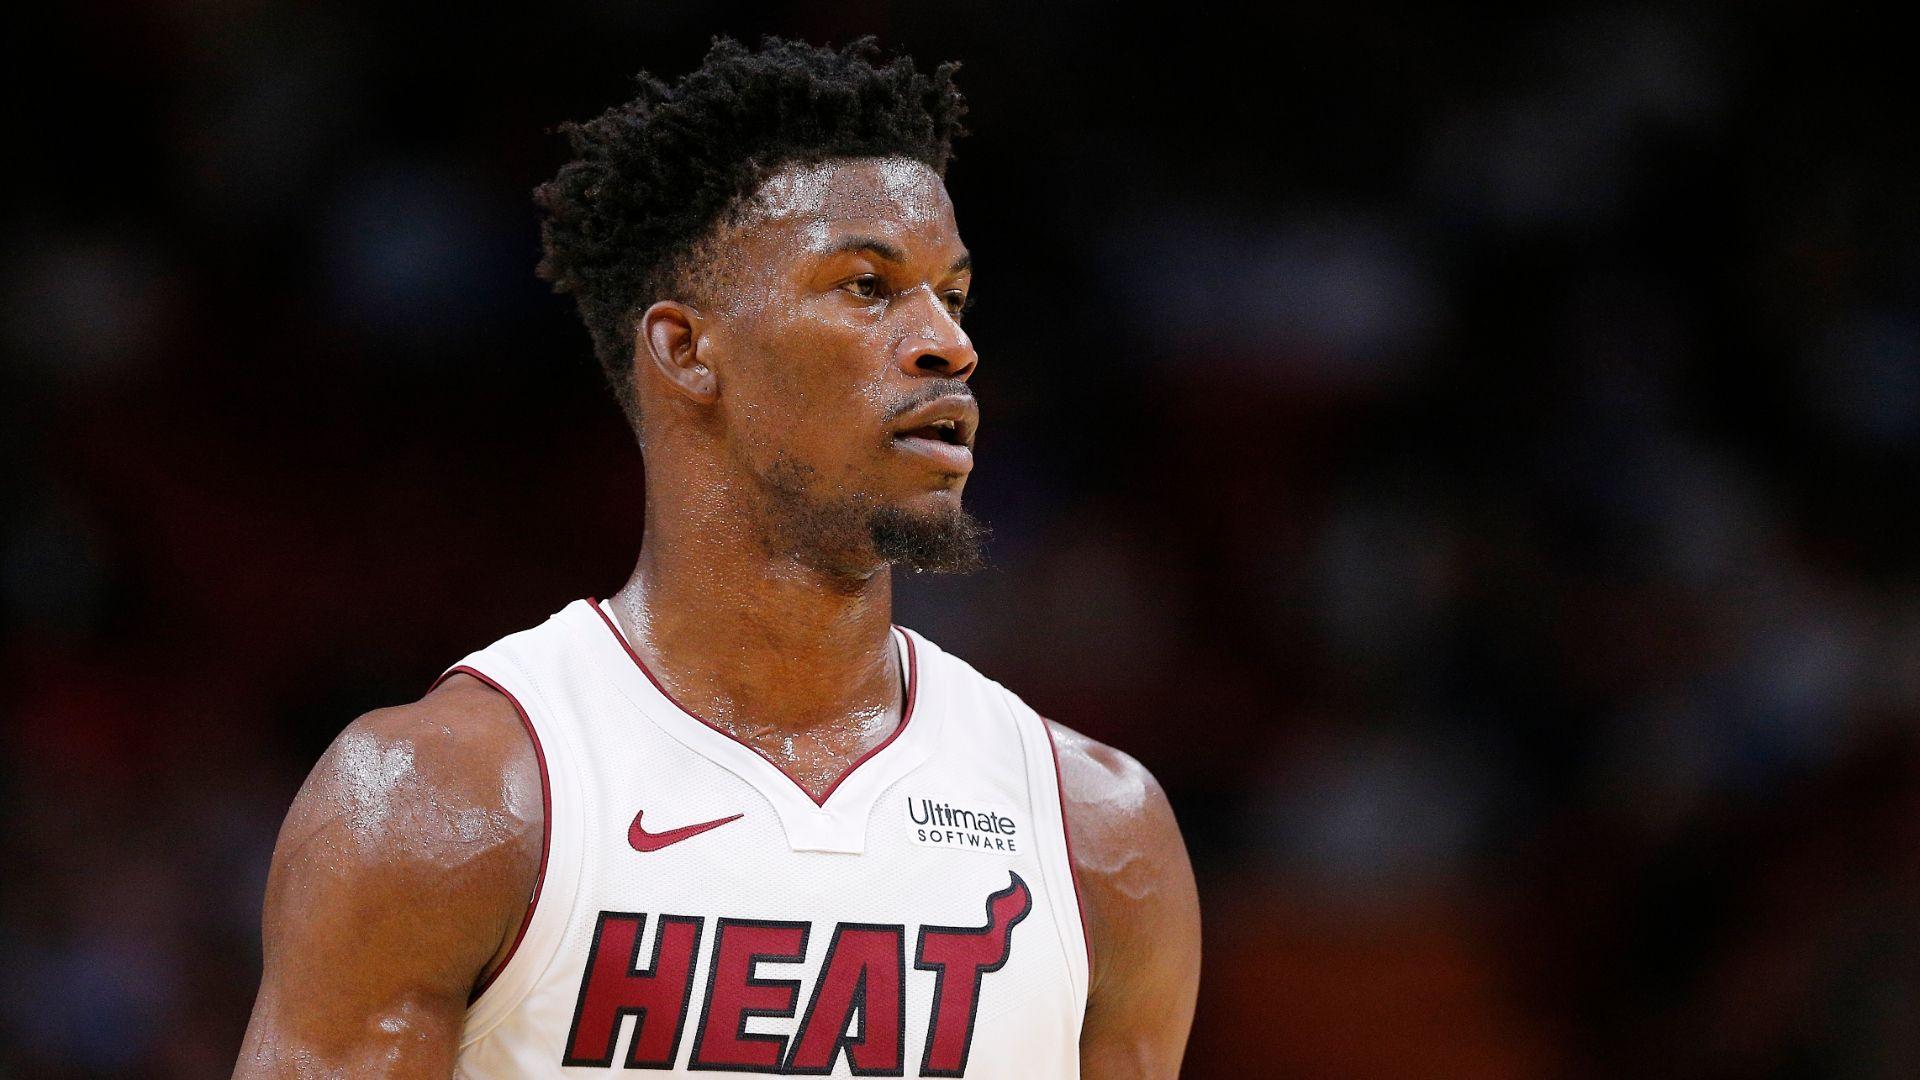 Heat Vs Bucks Game 4 / Milwaukee Bucks Vs Miami Heat Full Game 2 Highlights 2021 ... / Fiserv forum , milwaukee , wi.